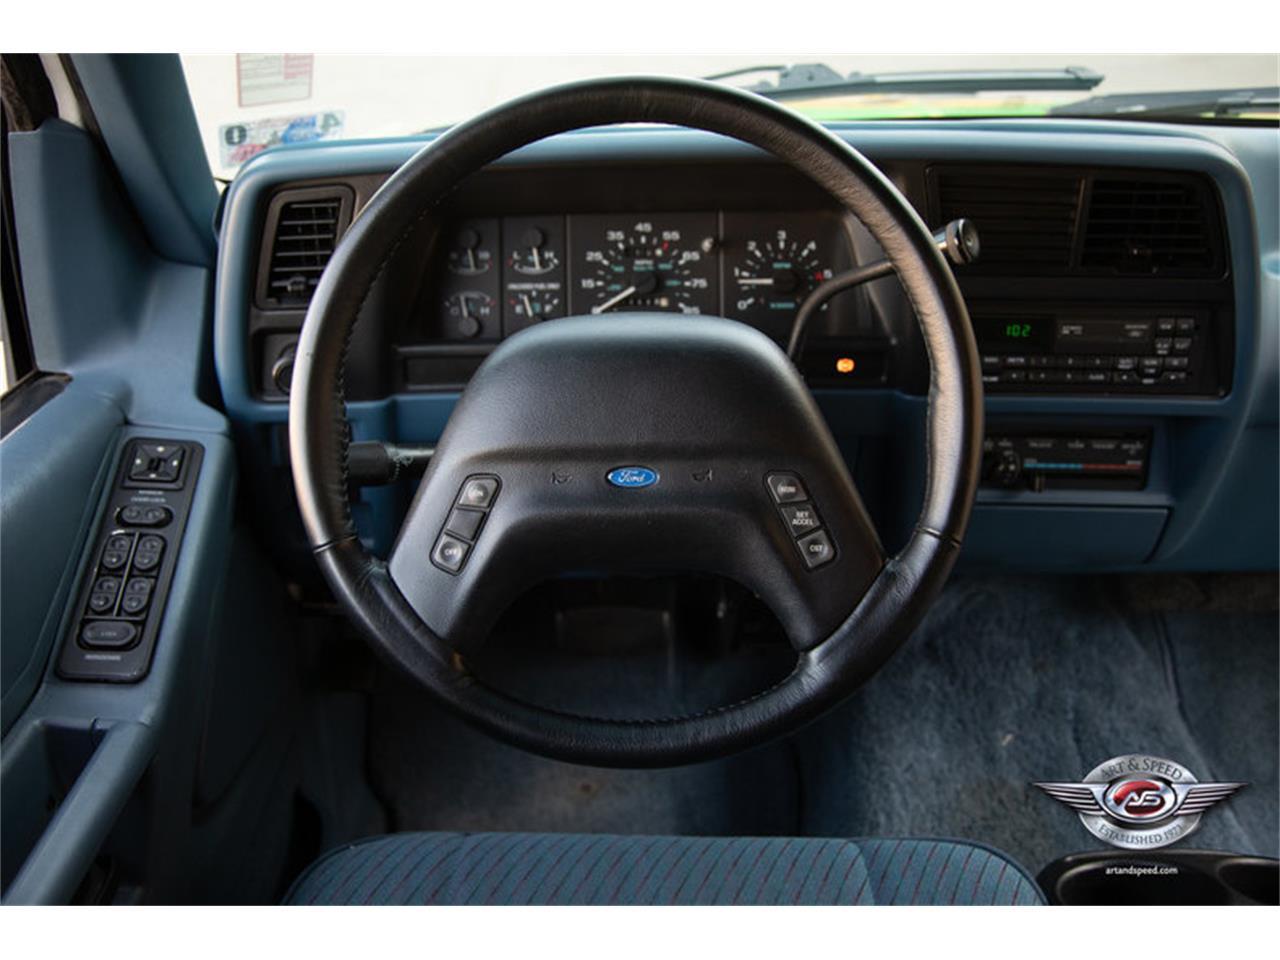 Large Picture of '93 Ford Explorer - $12,900.00 - NRIV